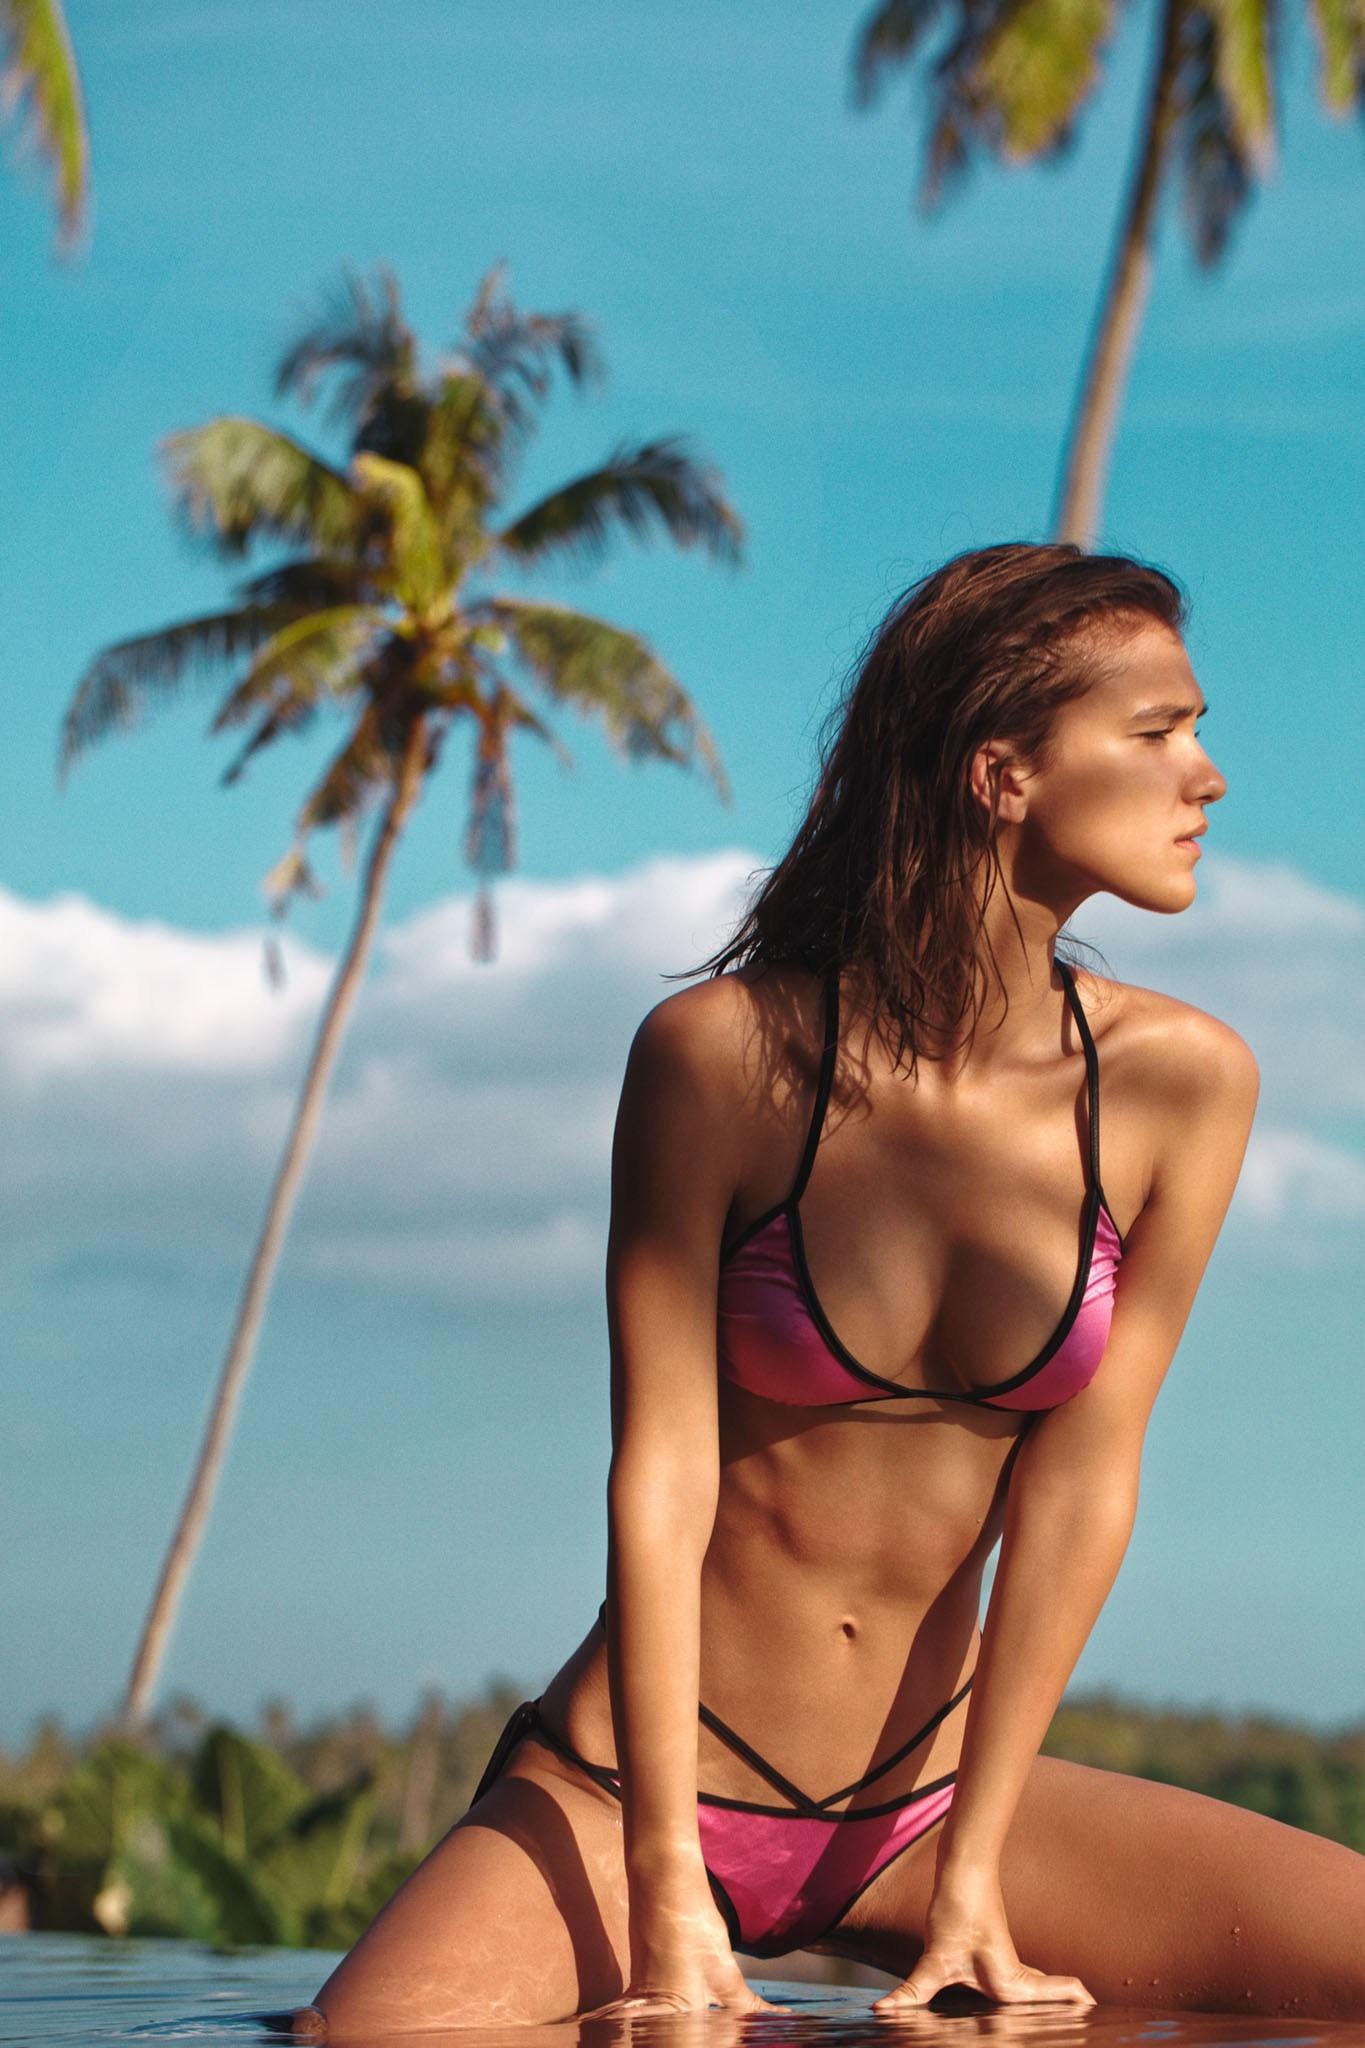 Paparazzi Paula Bulczynska naked (48 photo), Tits, Paparazzi, Feet, underwear 2015